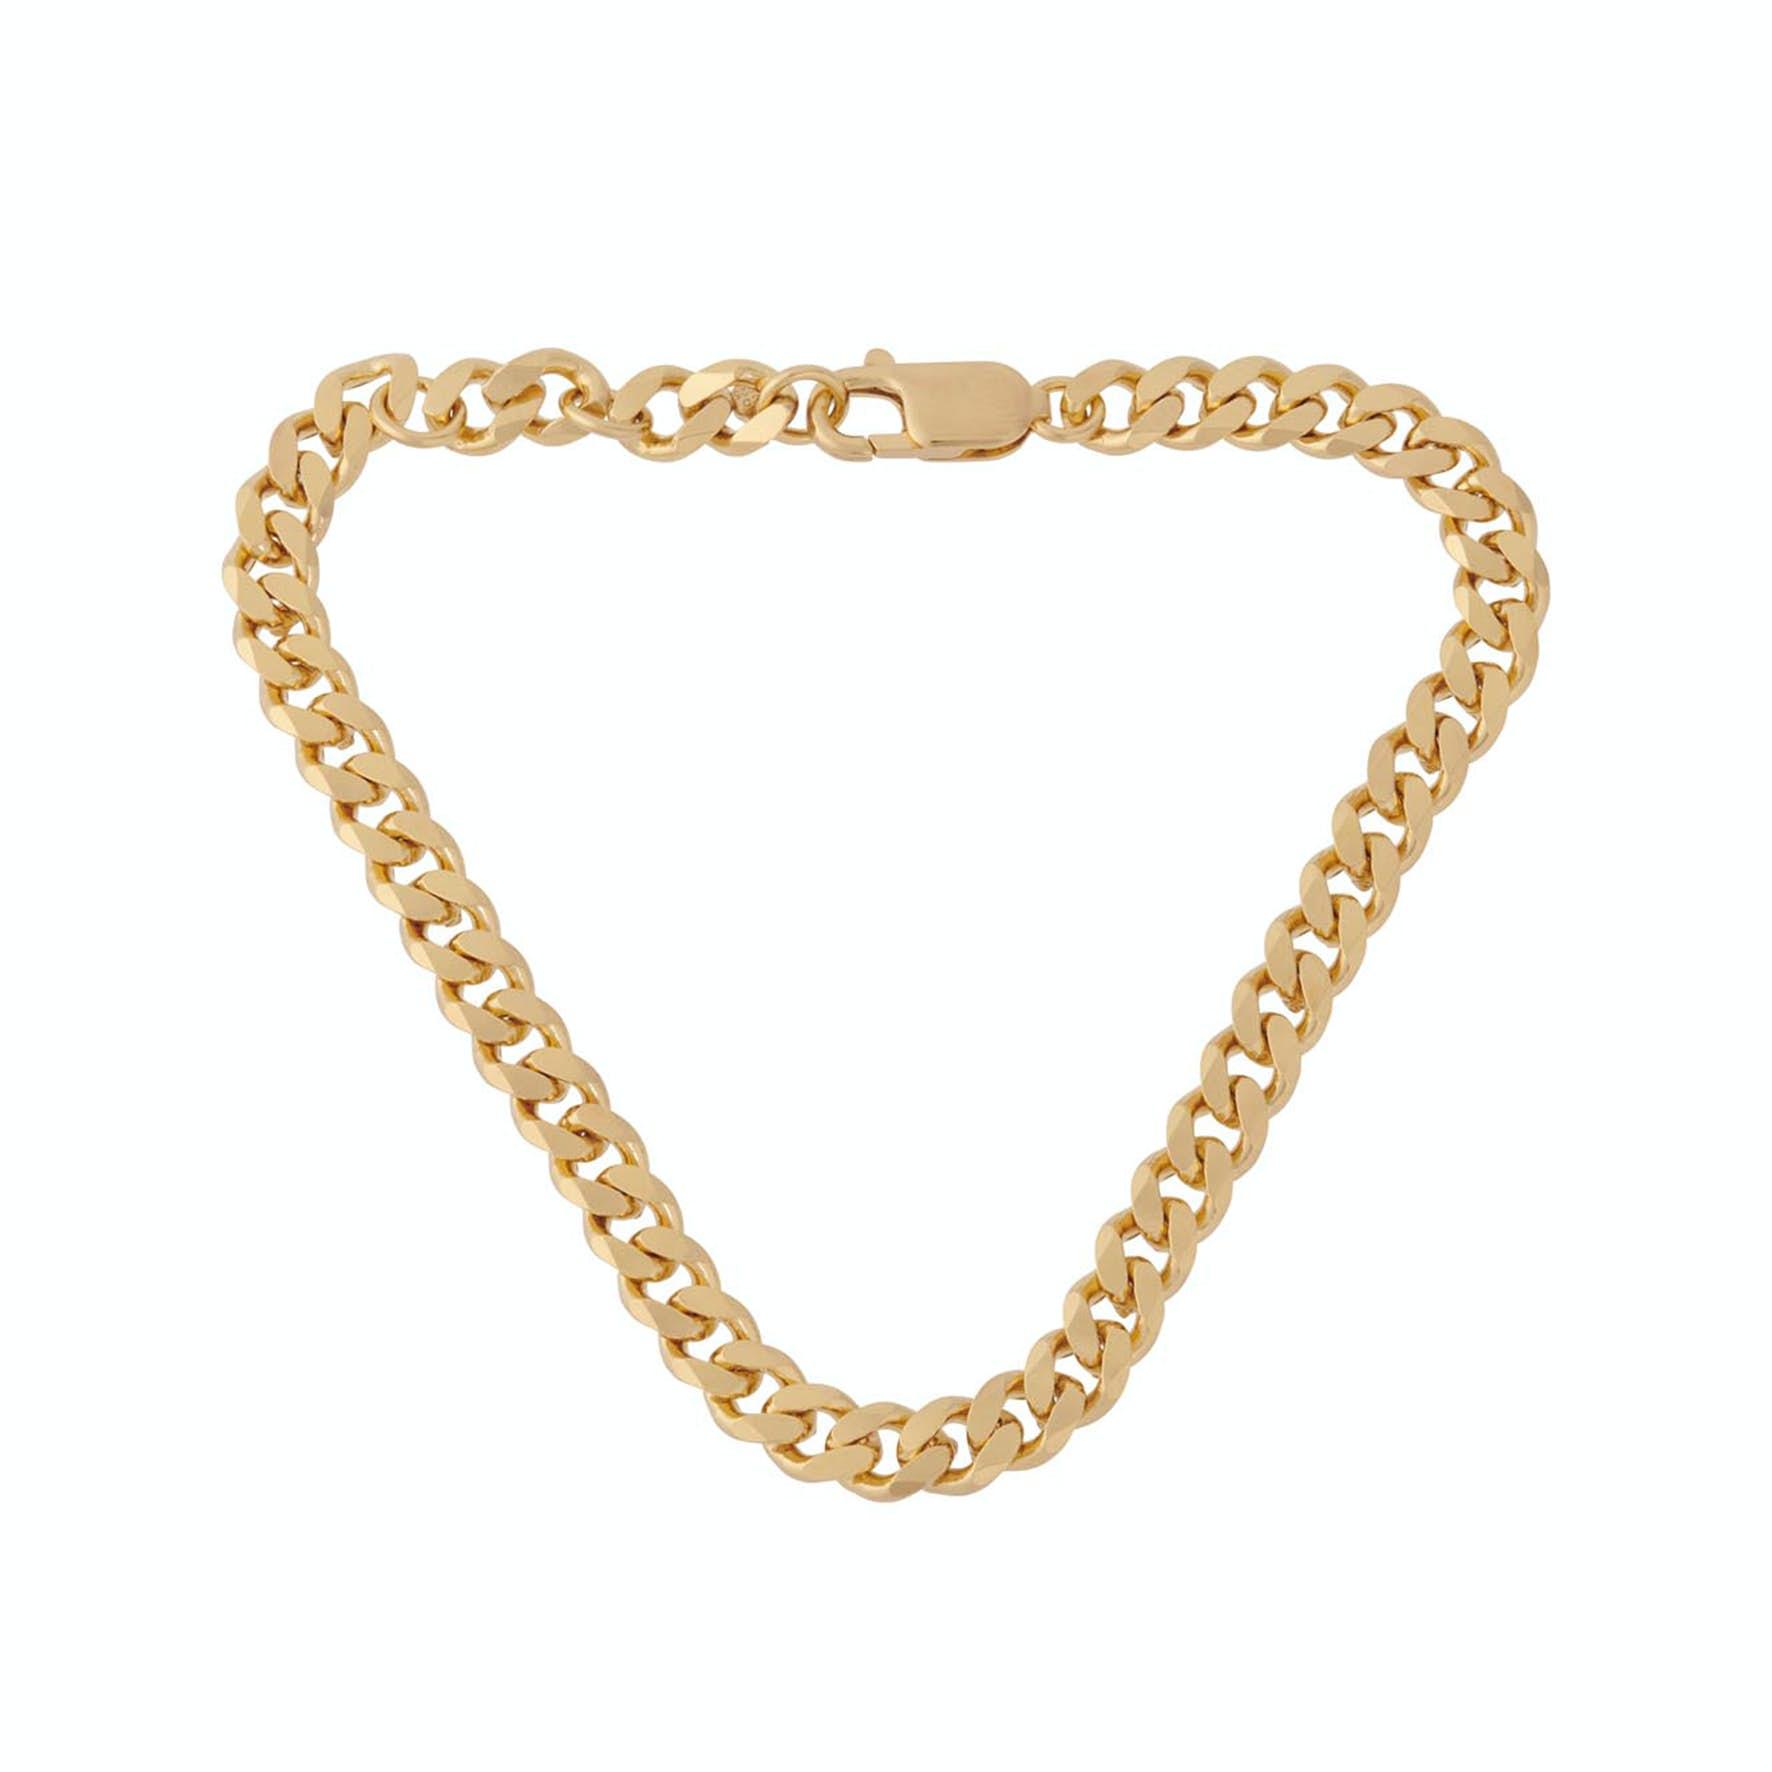 Solid Bracelet von Pernille Corydon in Vergoldet-Silber Sterling 925